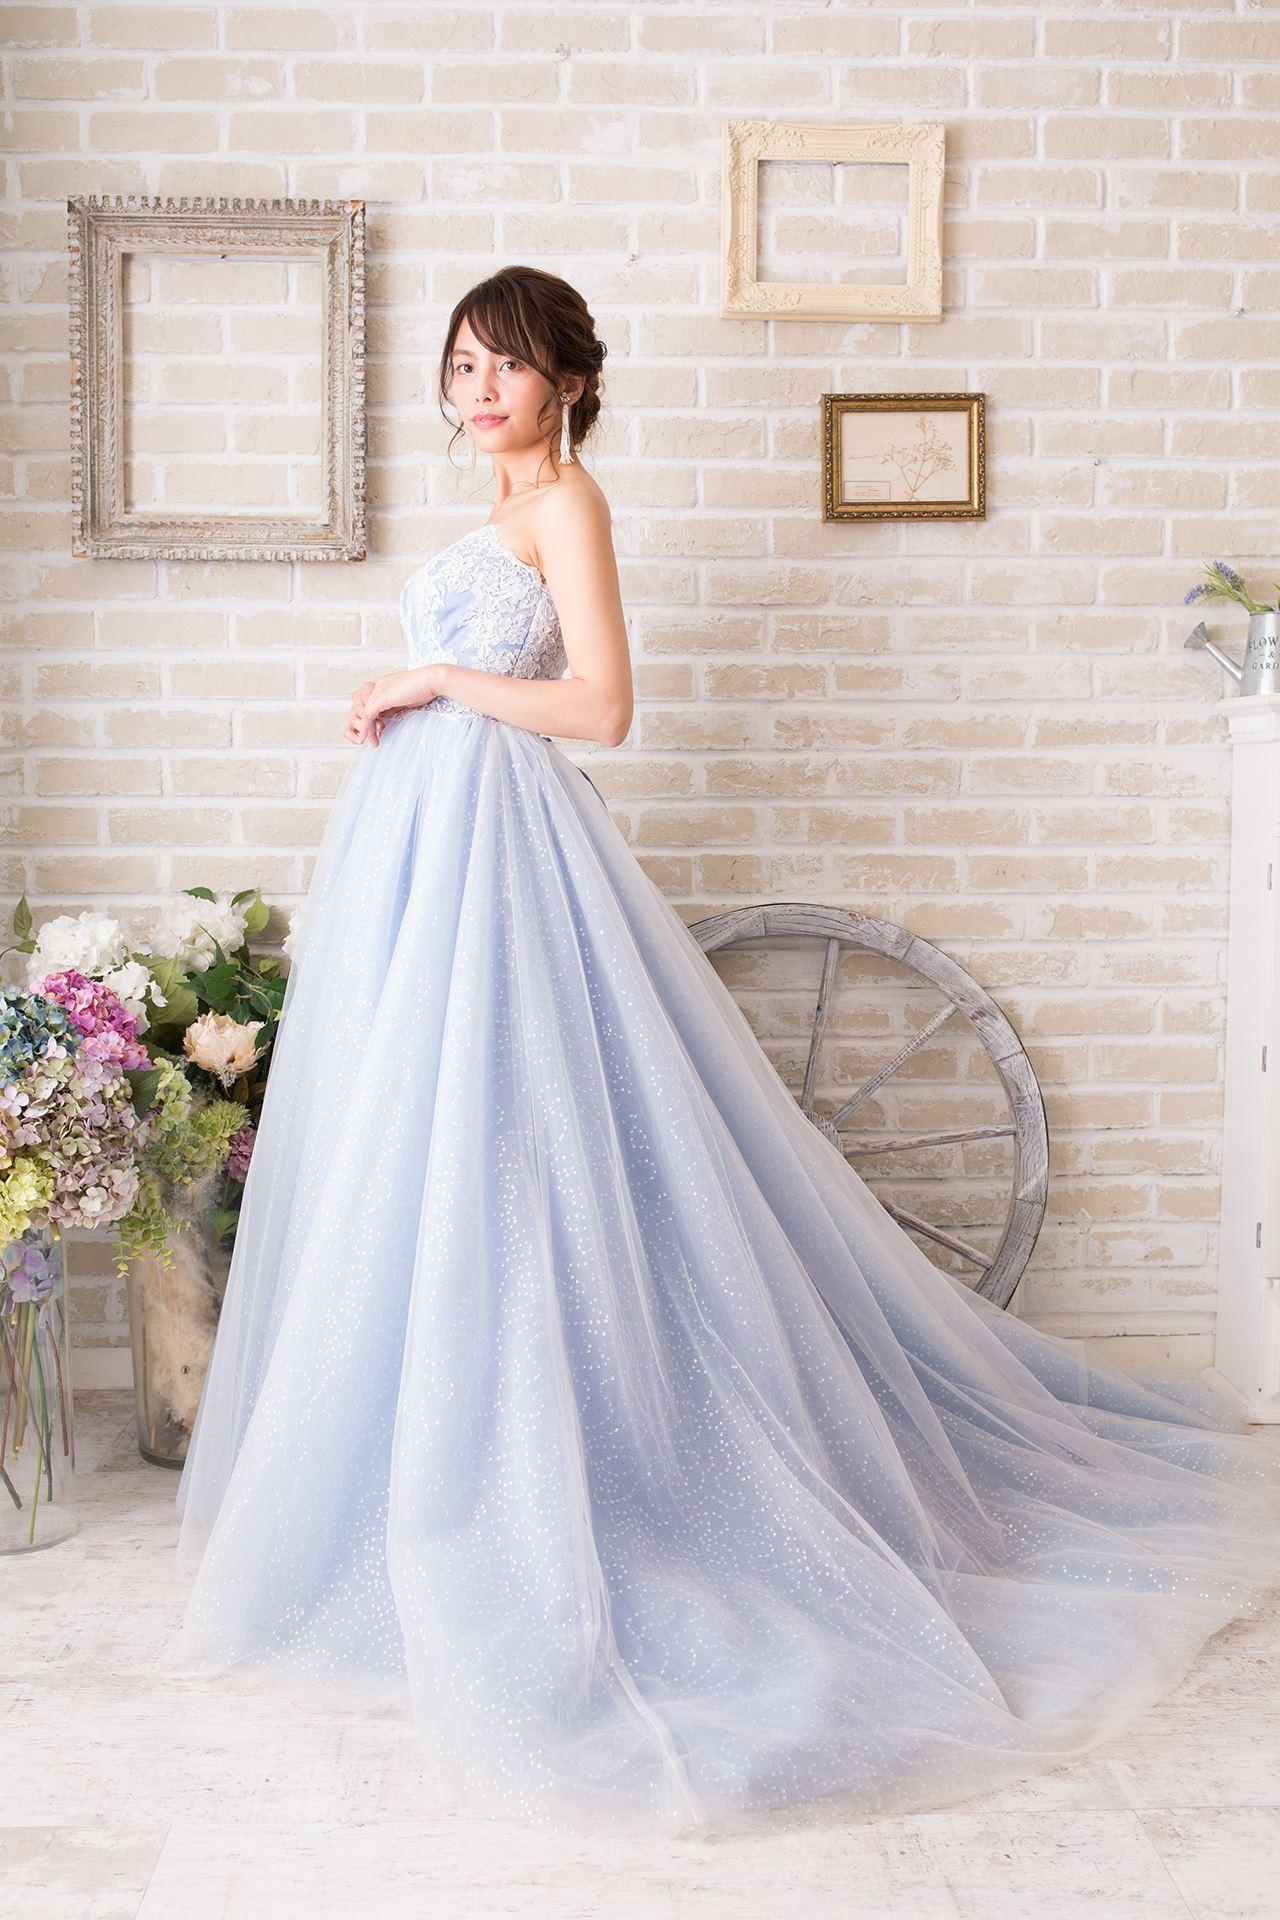 yk_nr_dress_471